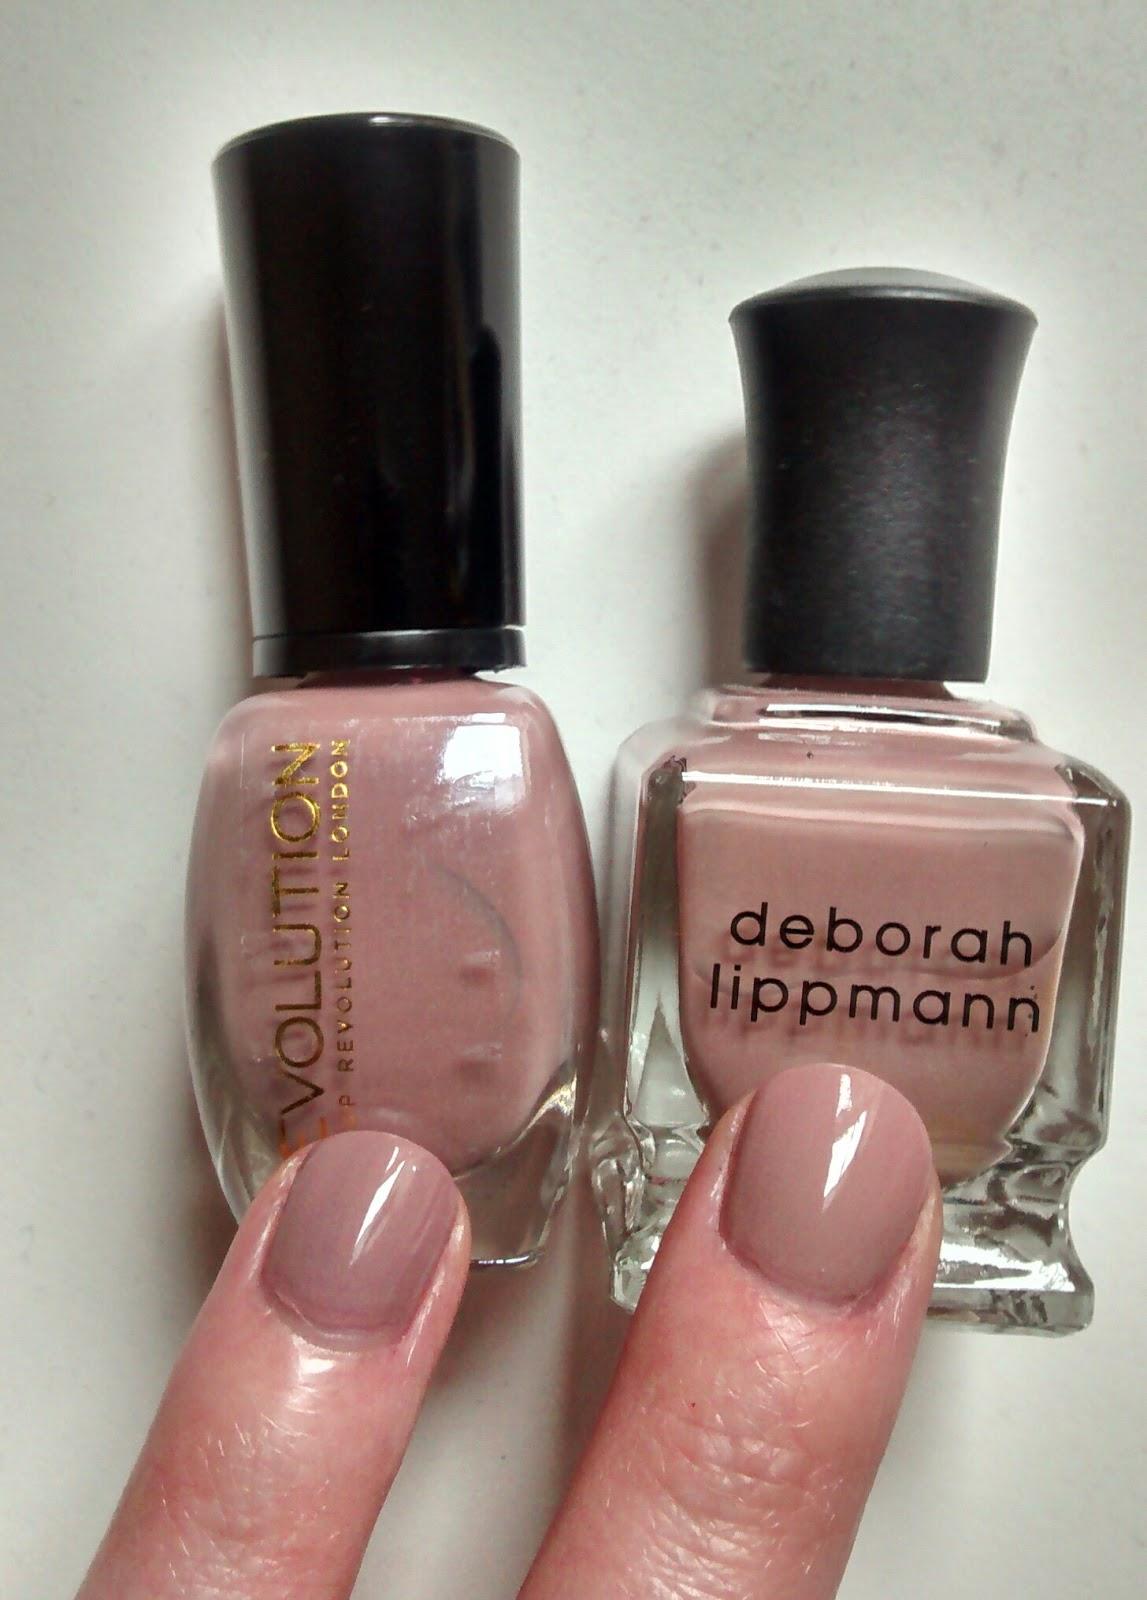 The Lardy Grub: Makeup Revolution £1 Deborah Lippmann Dupe!